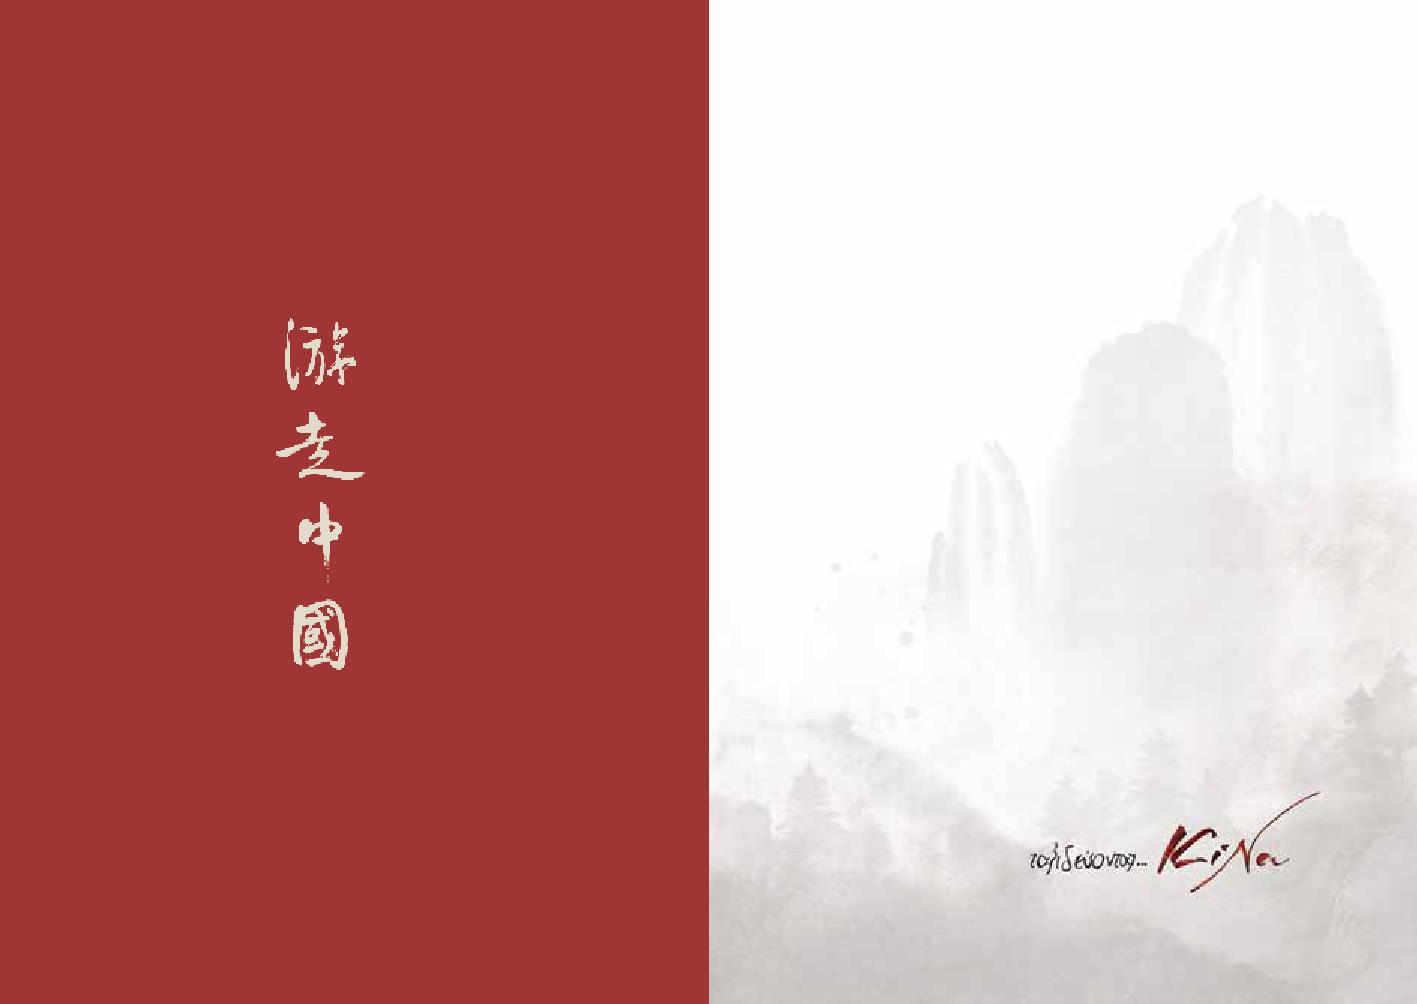 Travelling_china_salonia-22-1.jpg